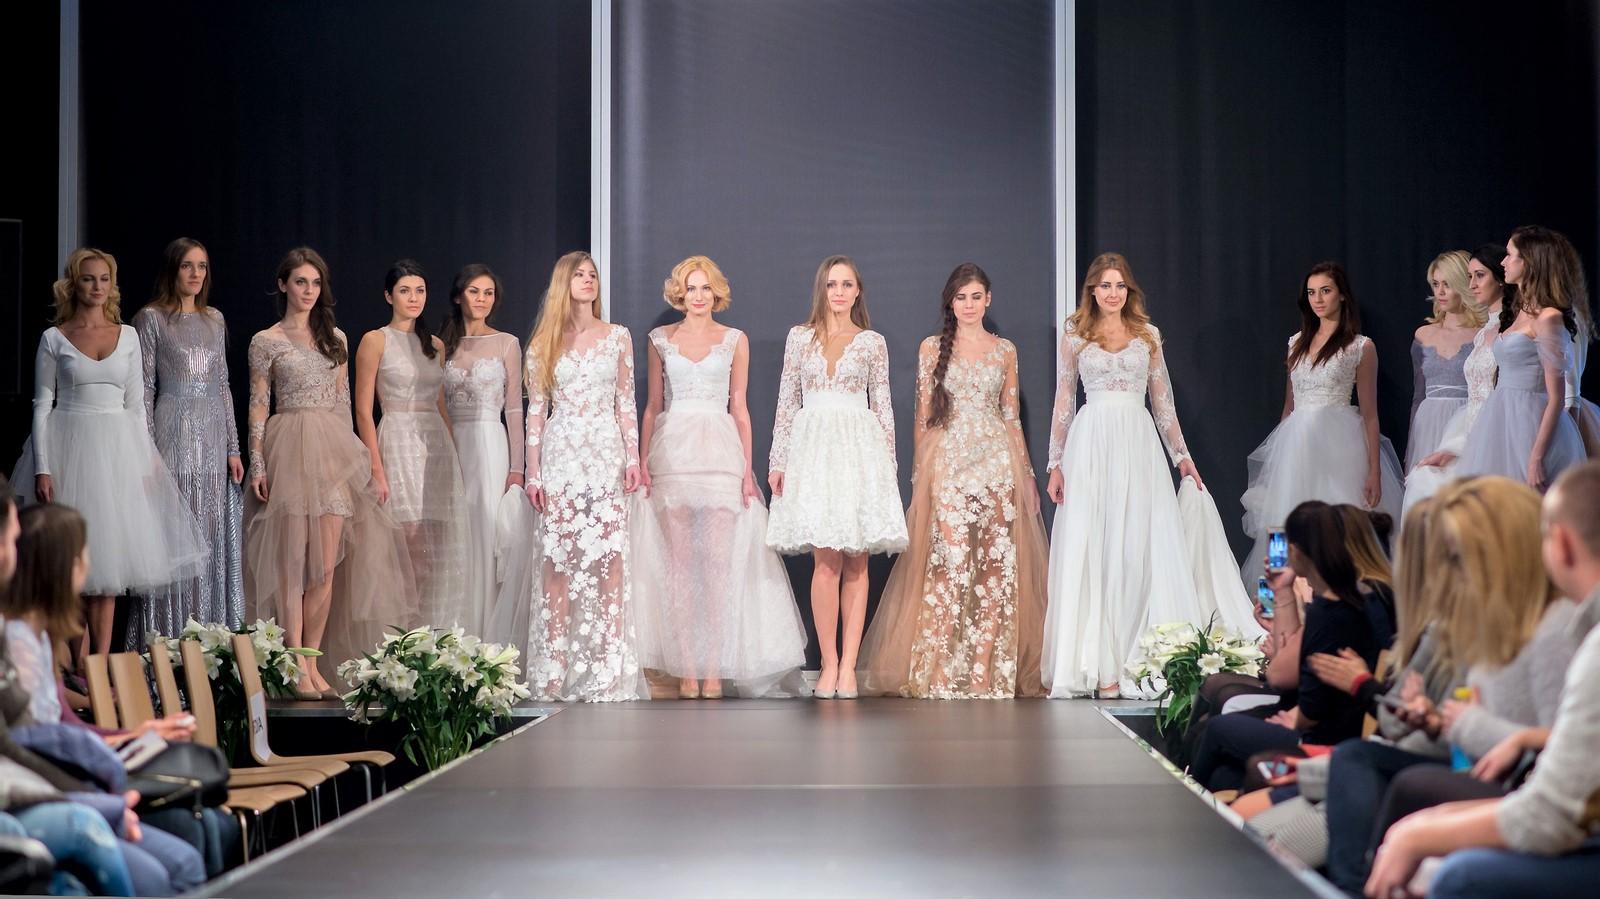 imt24-targi-slubne-wedding-fot-lemonfoto-2